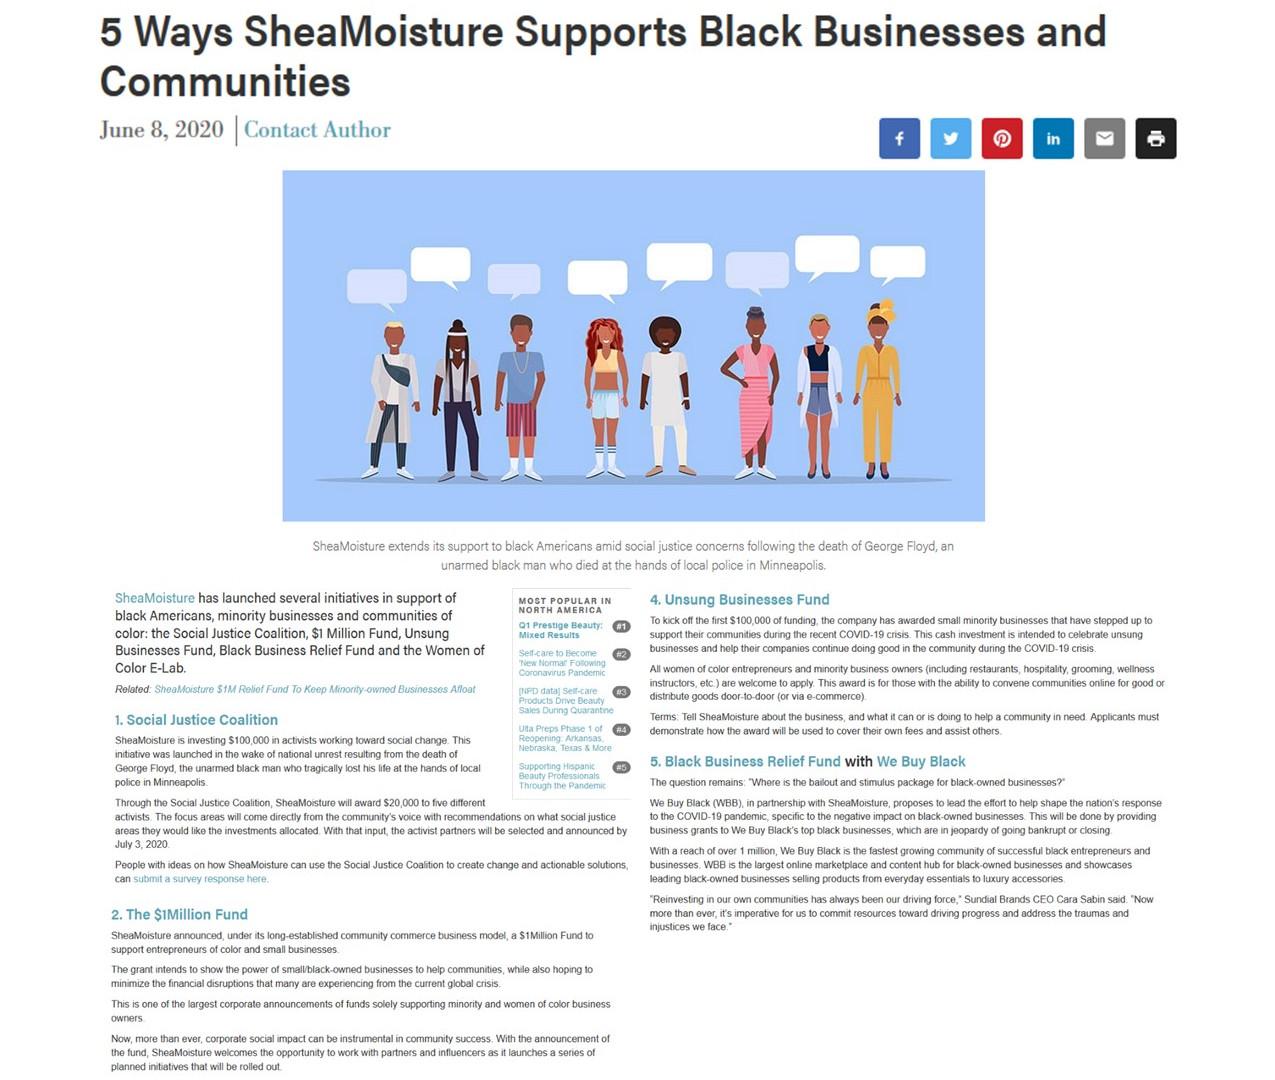 GCIMagazine.com_6.8.20.jpg